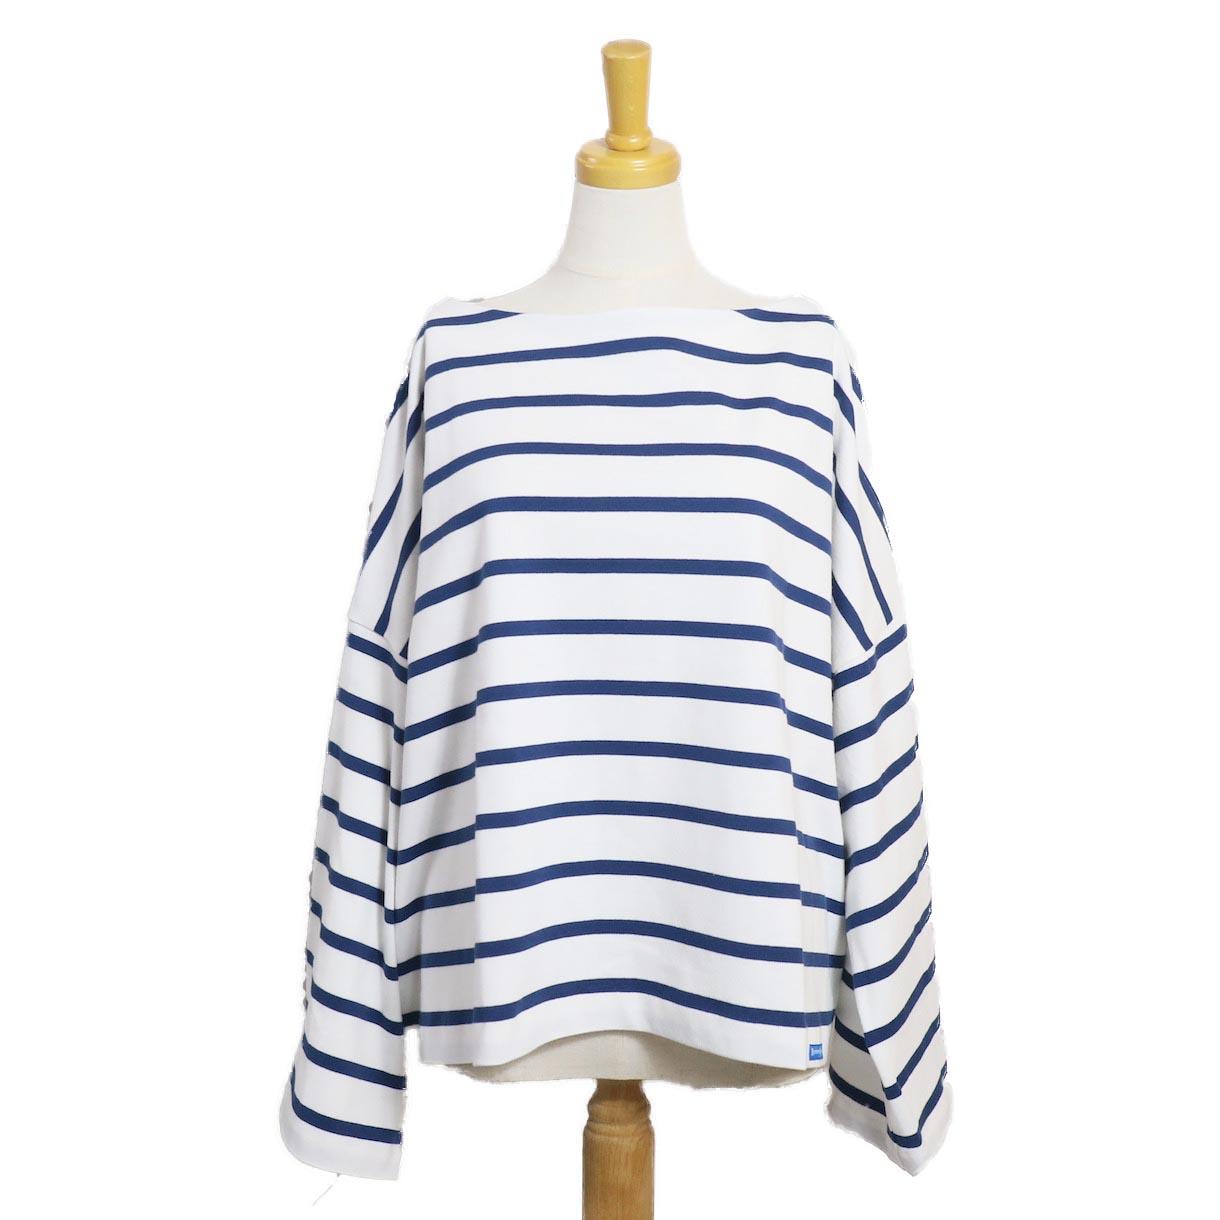 BLUEBIRD BOULEVARD / ボーダーバスクシャツ(長袖)BLUE